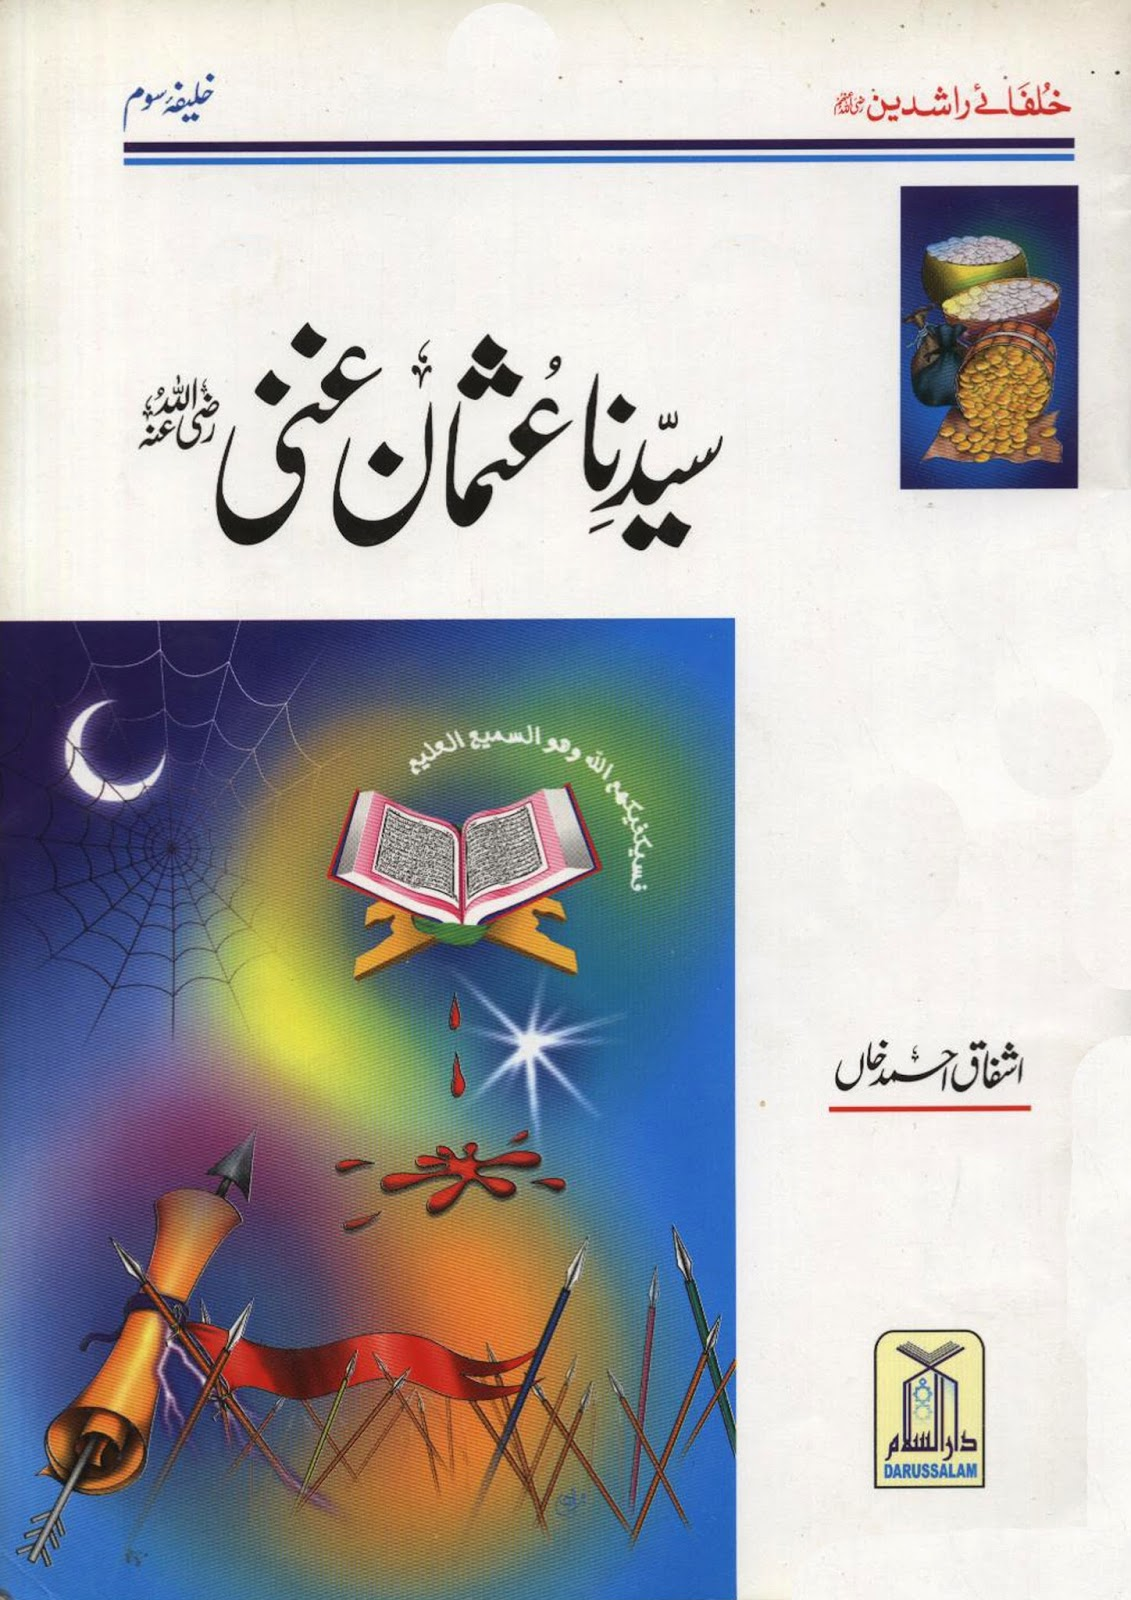 http://urduguru1.blogspot.com/2014/02/khalifa-e-soem-usman-ghani-razi-allahu.html